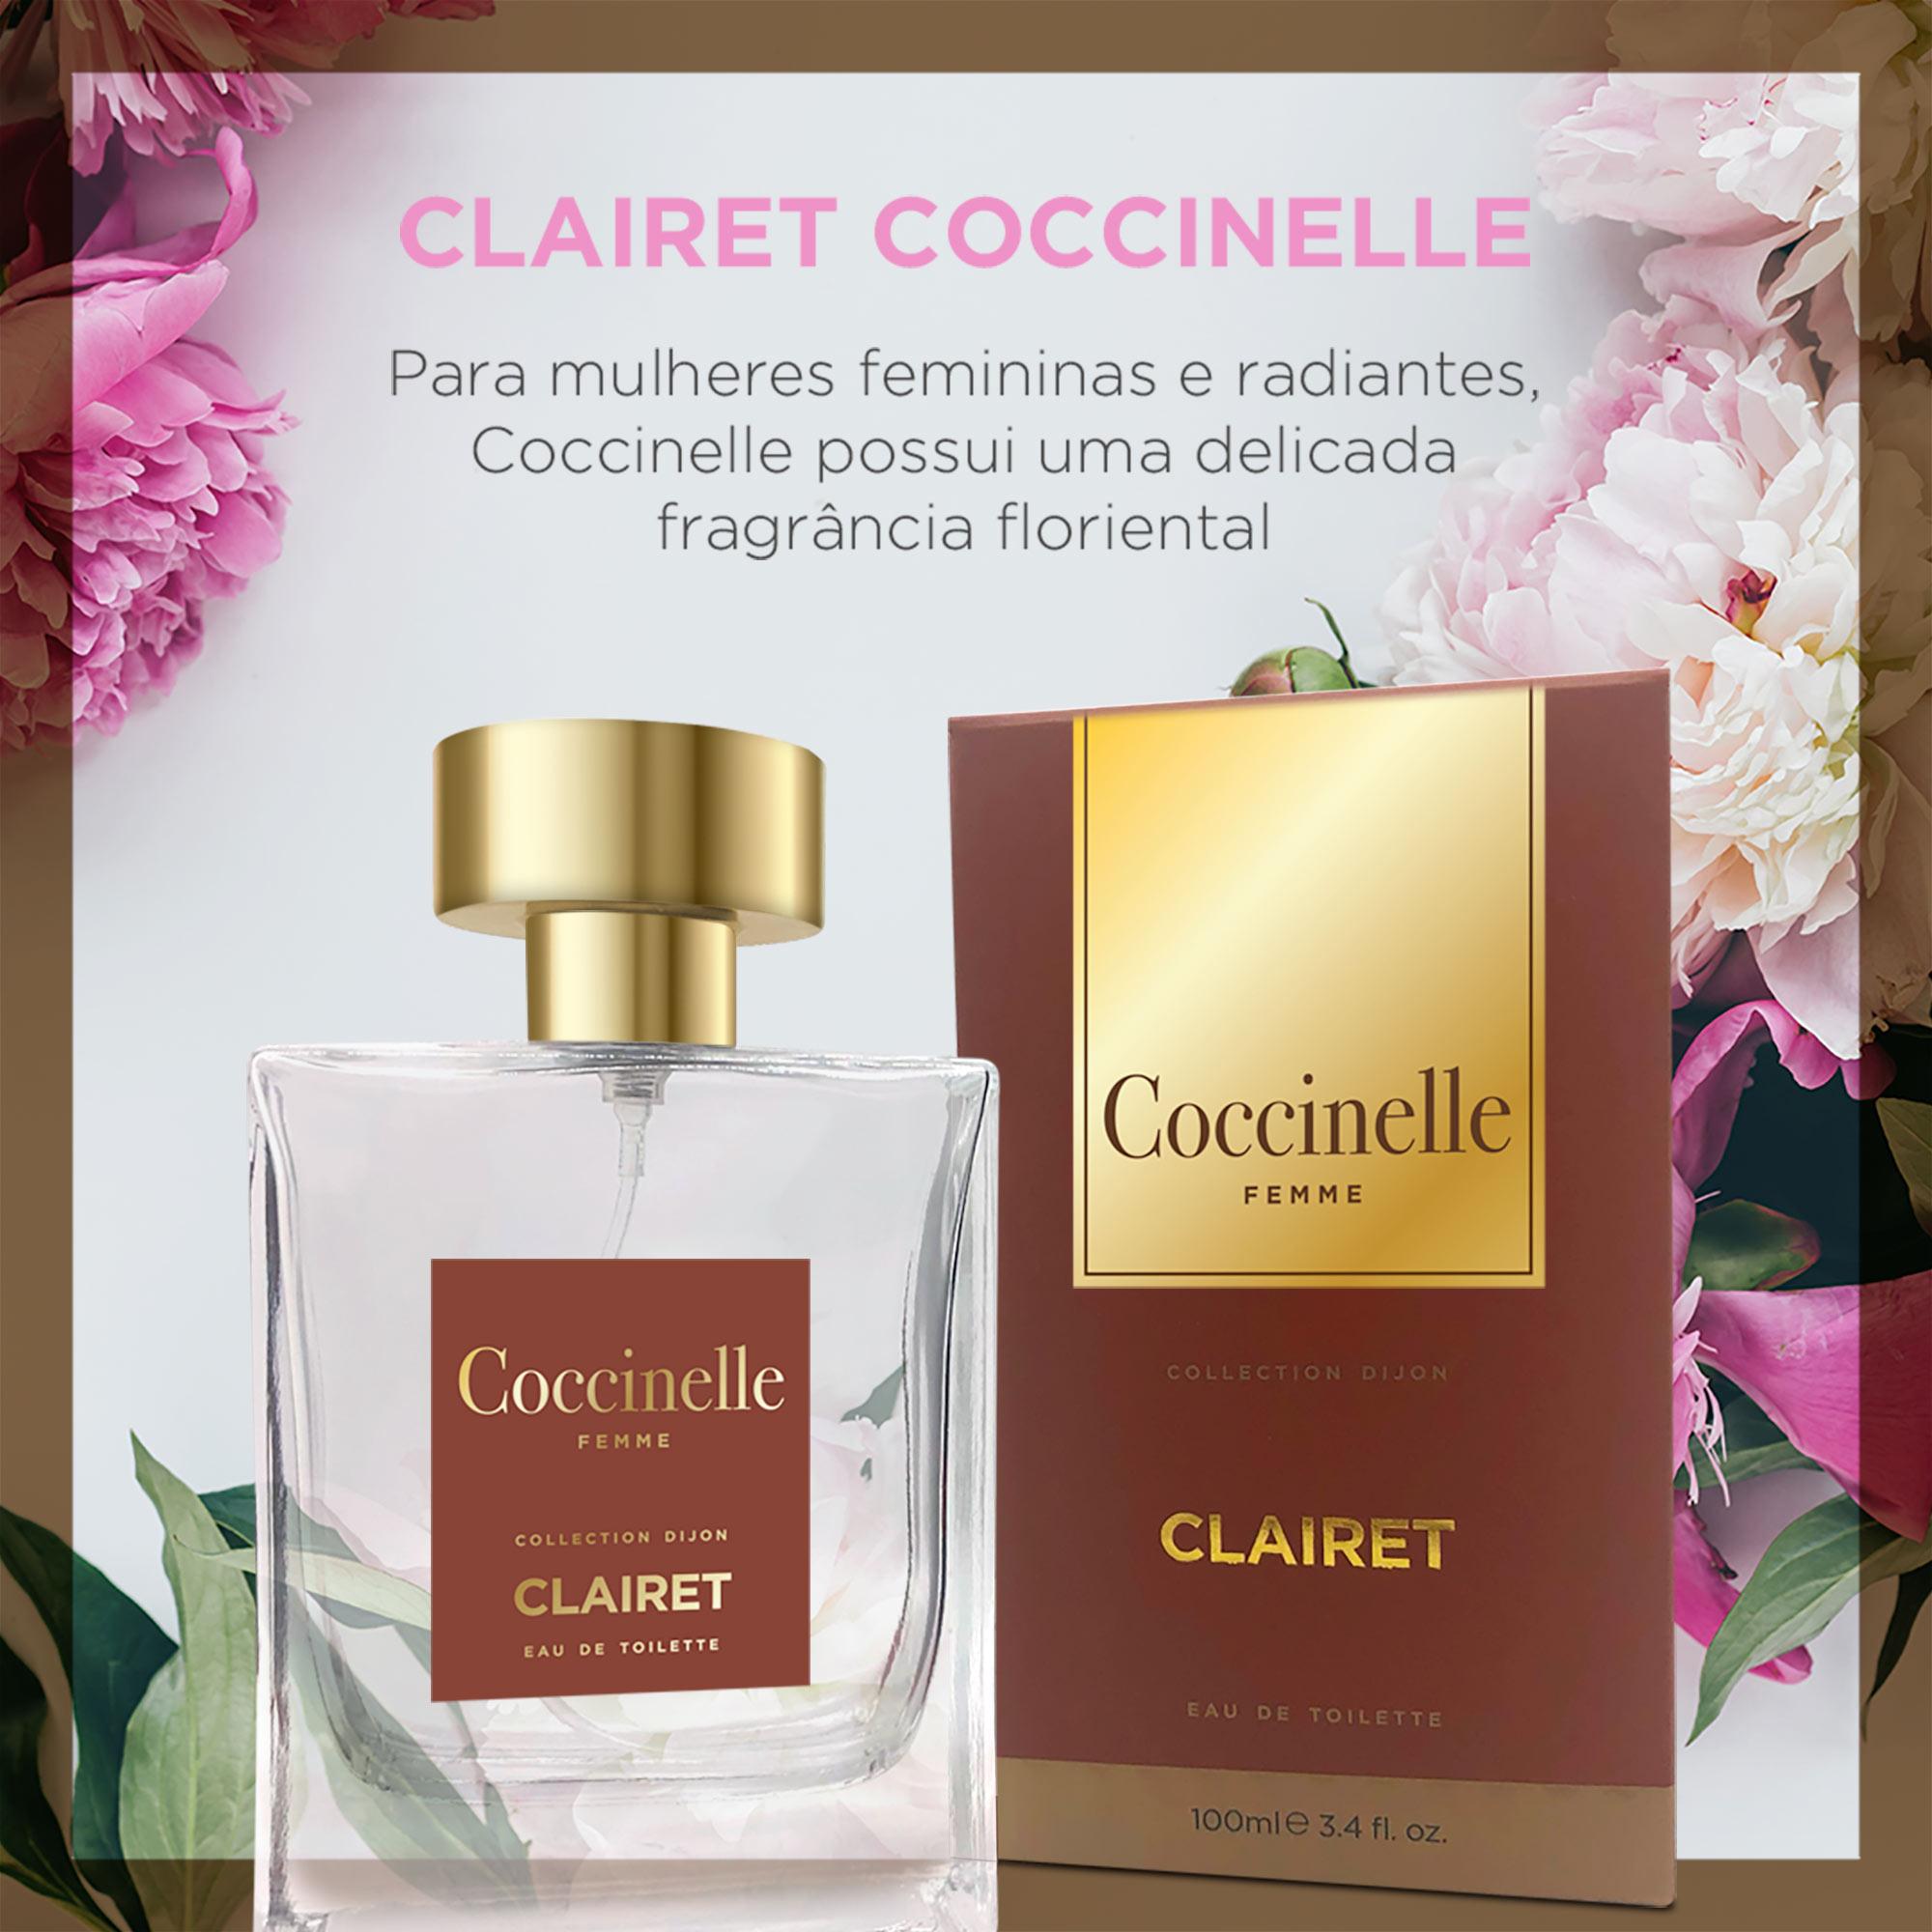 Clairet Coccinelle - Collection Dijon